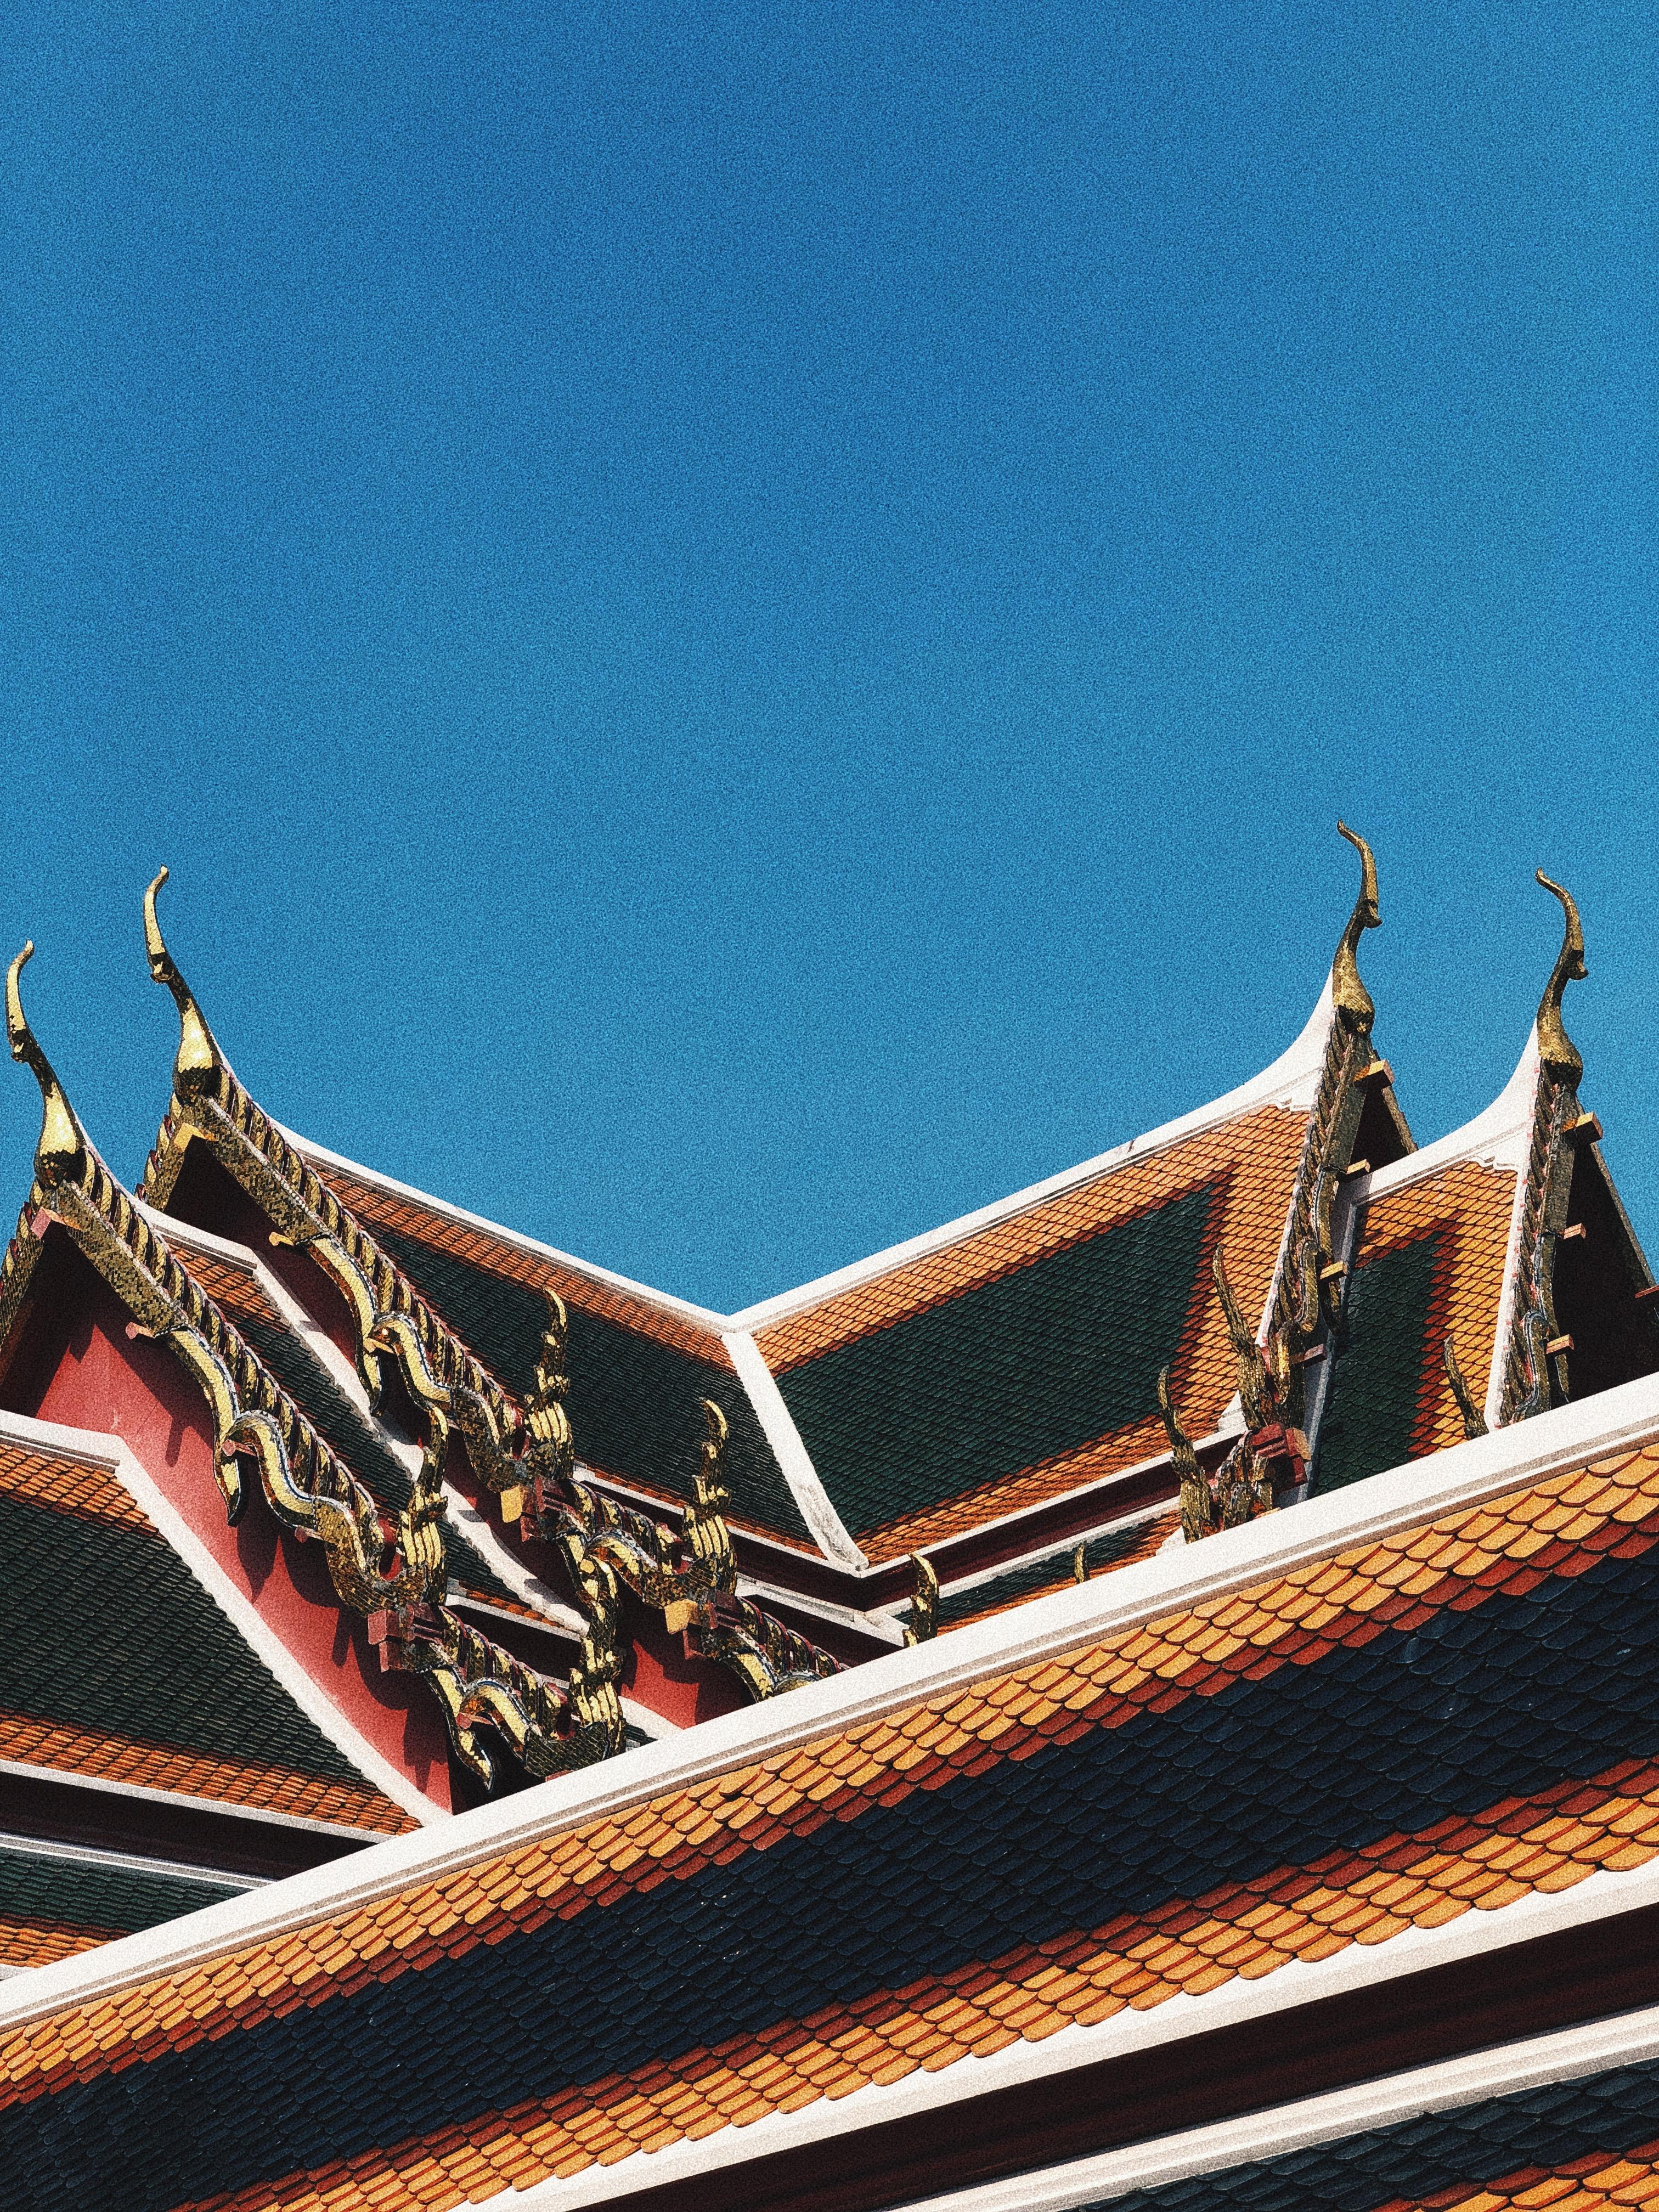 telhados listrados no templo Wat Pho. Foto: Augusto Mariotti